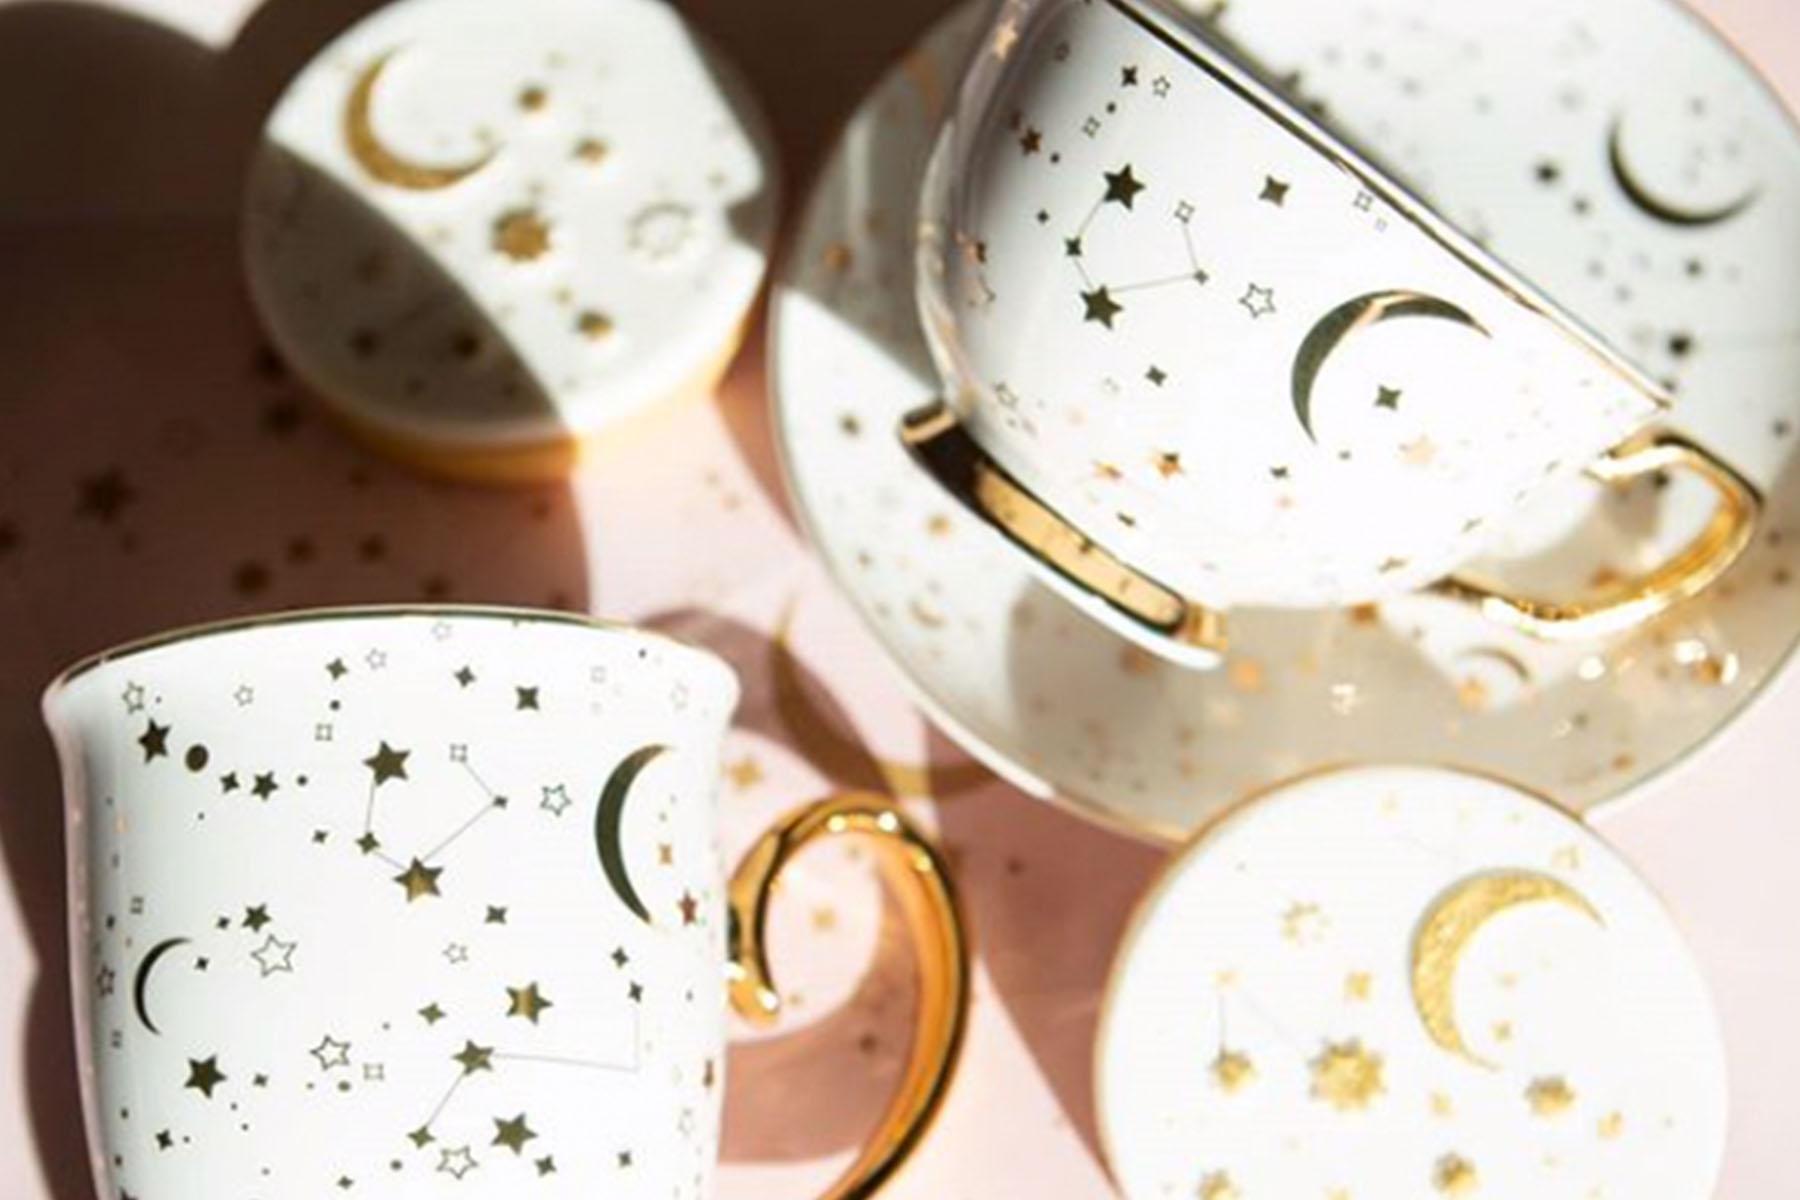 starry tea cups